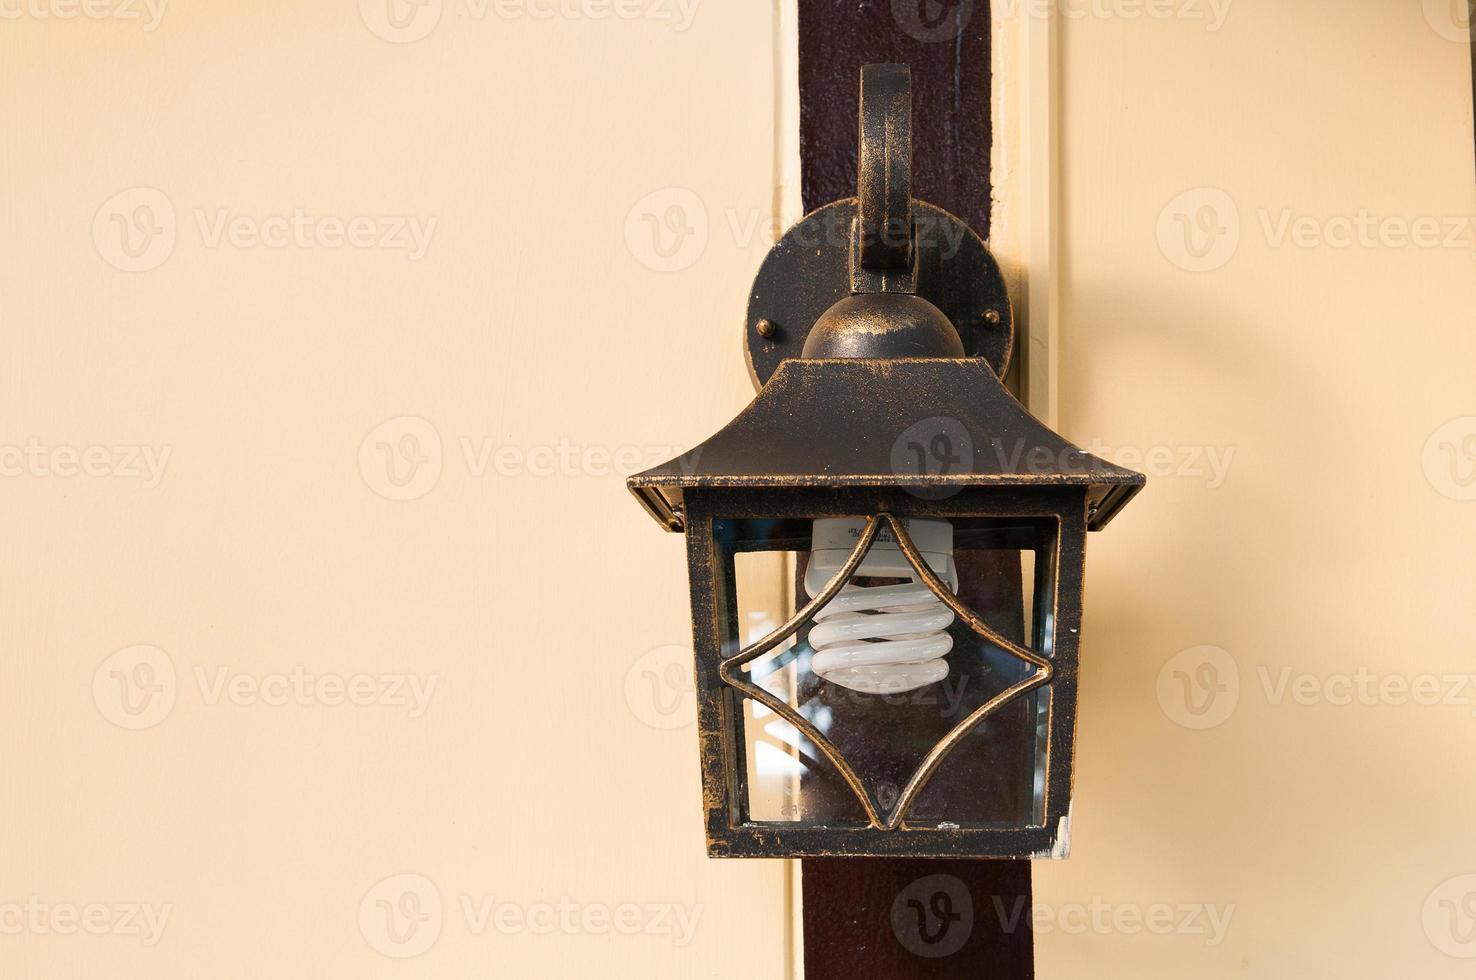 wandlamp foto